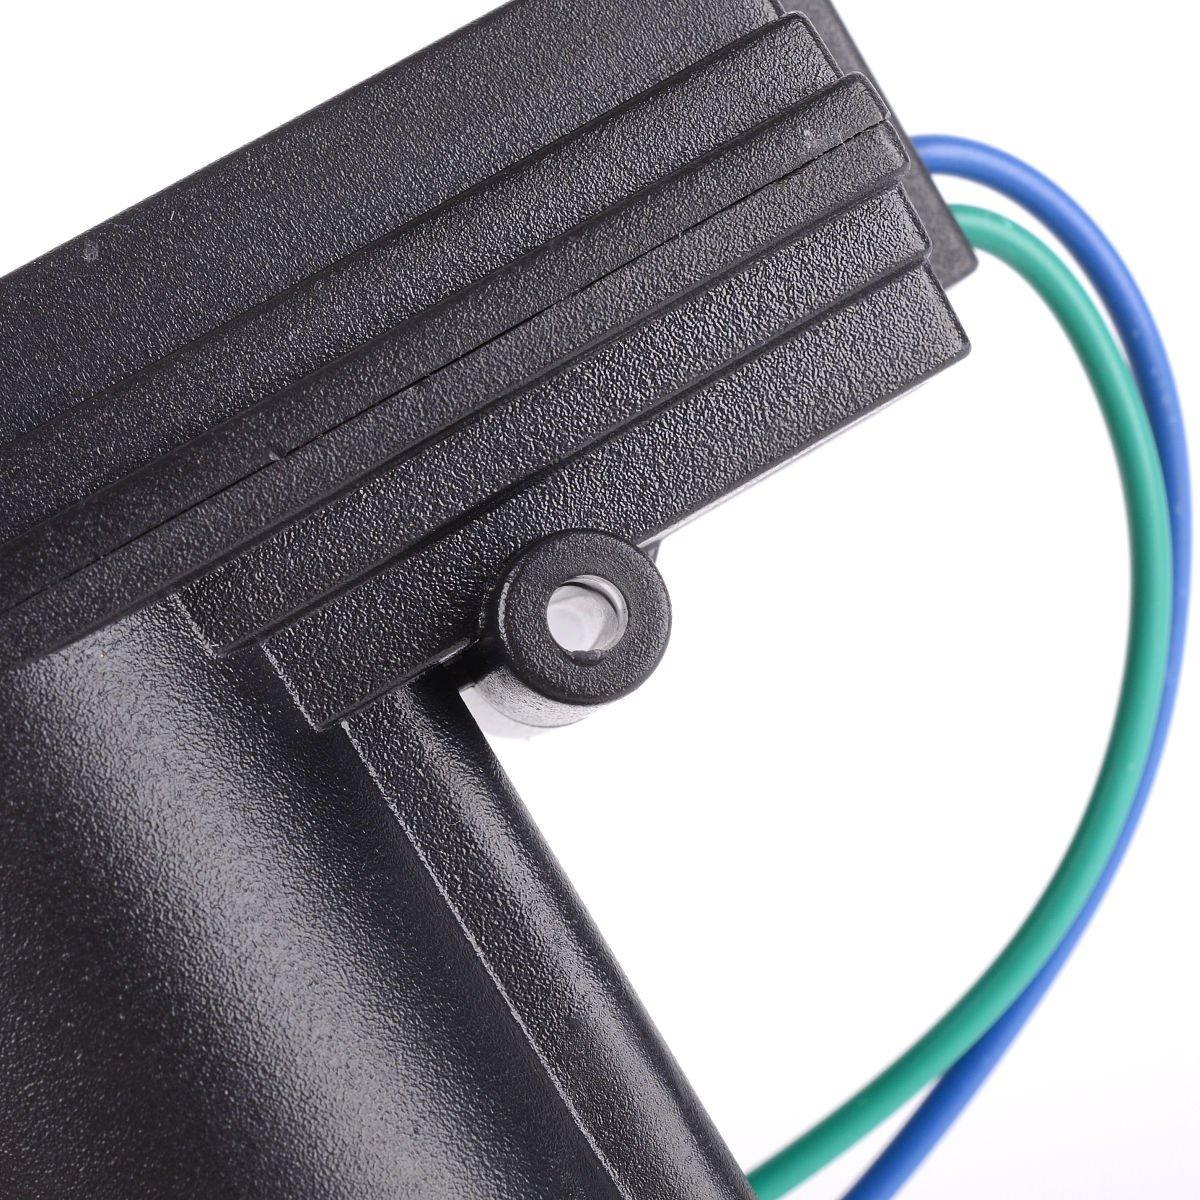 Universal Car Auto Heavy Duty Power Central Door Lock Actuator Motor 2 Wire Wiring Wires 12v Locking